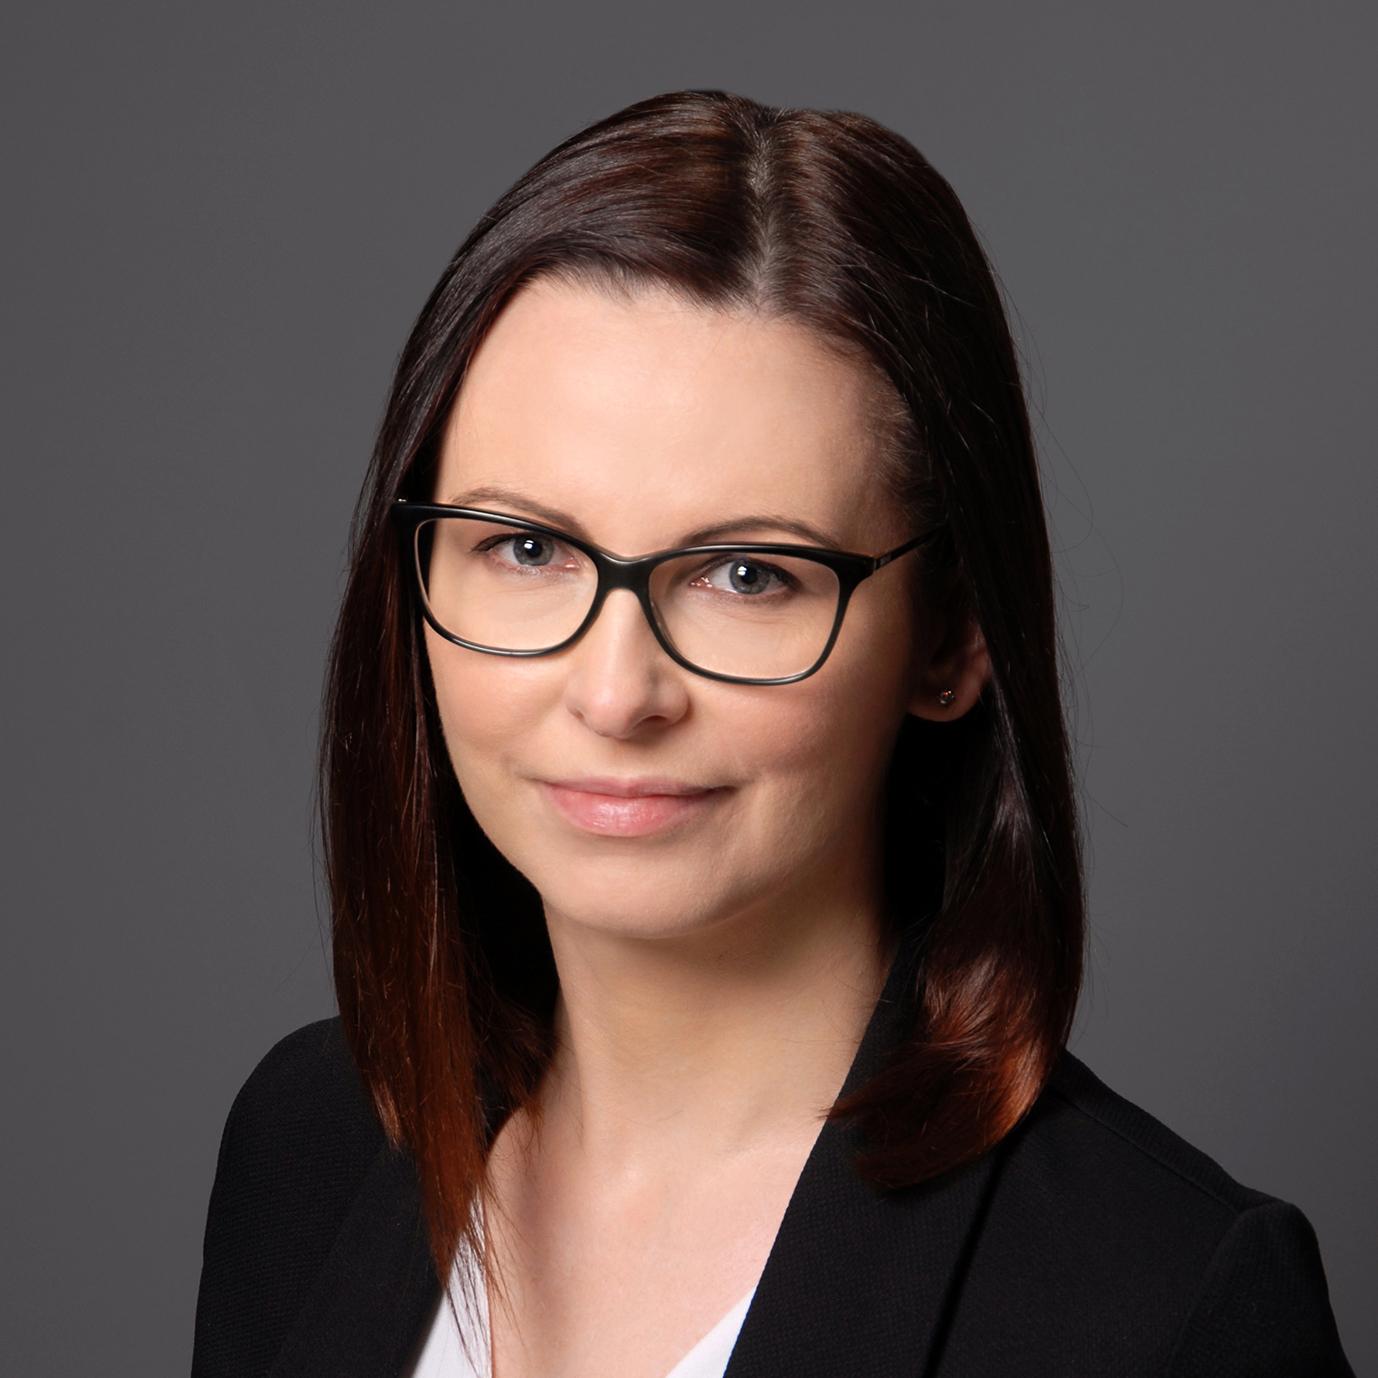 Paulina Leciej–Nowak